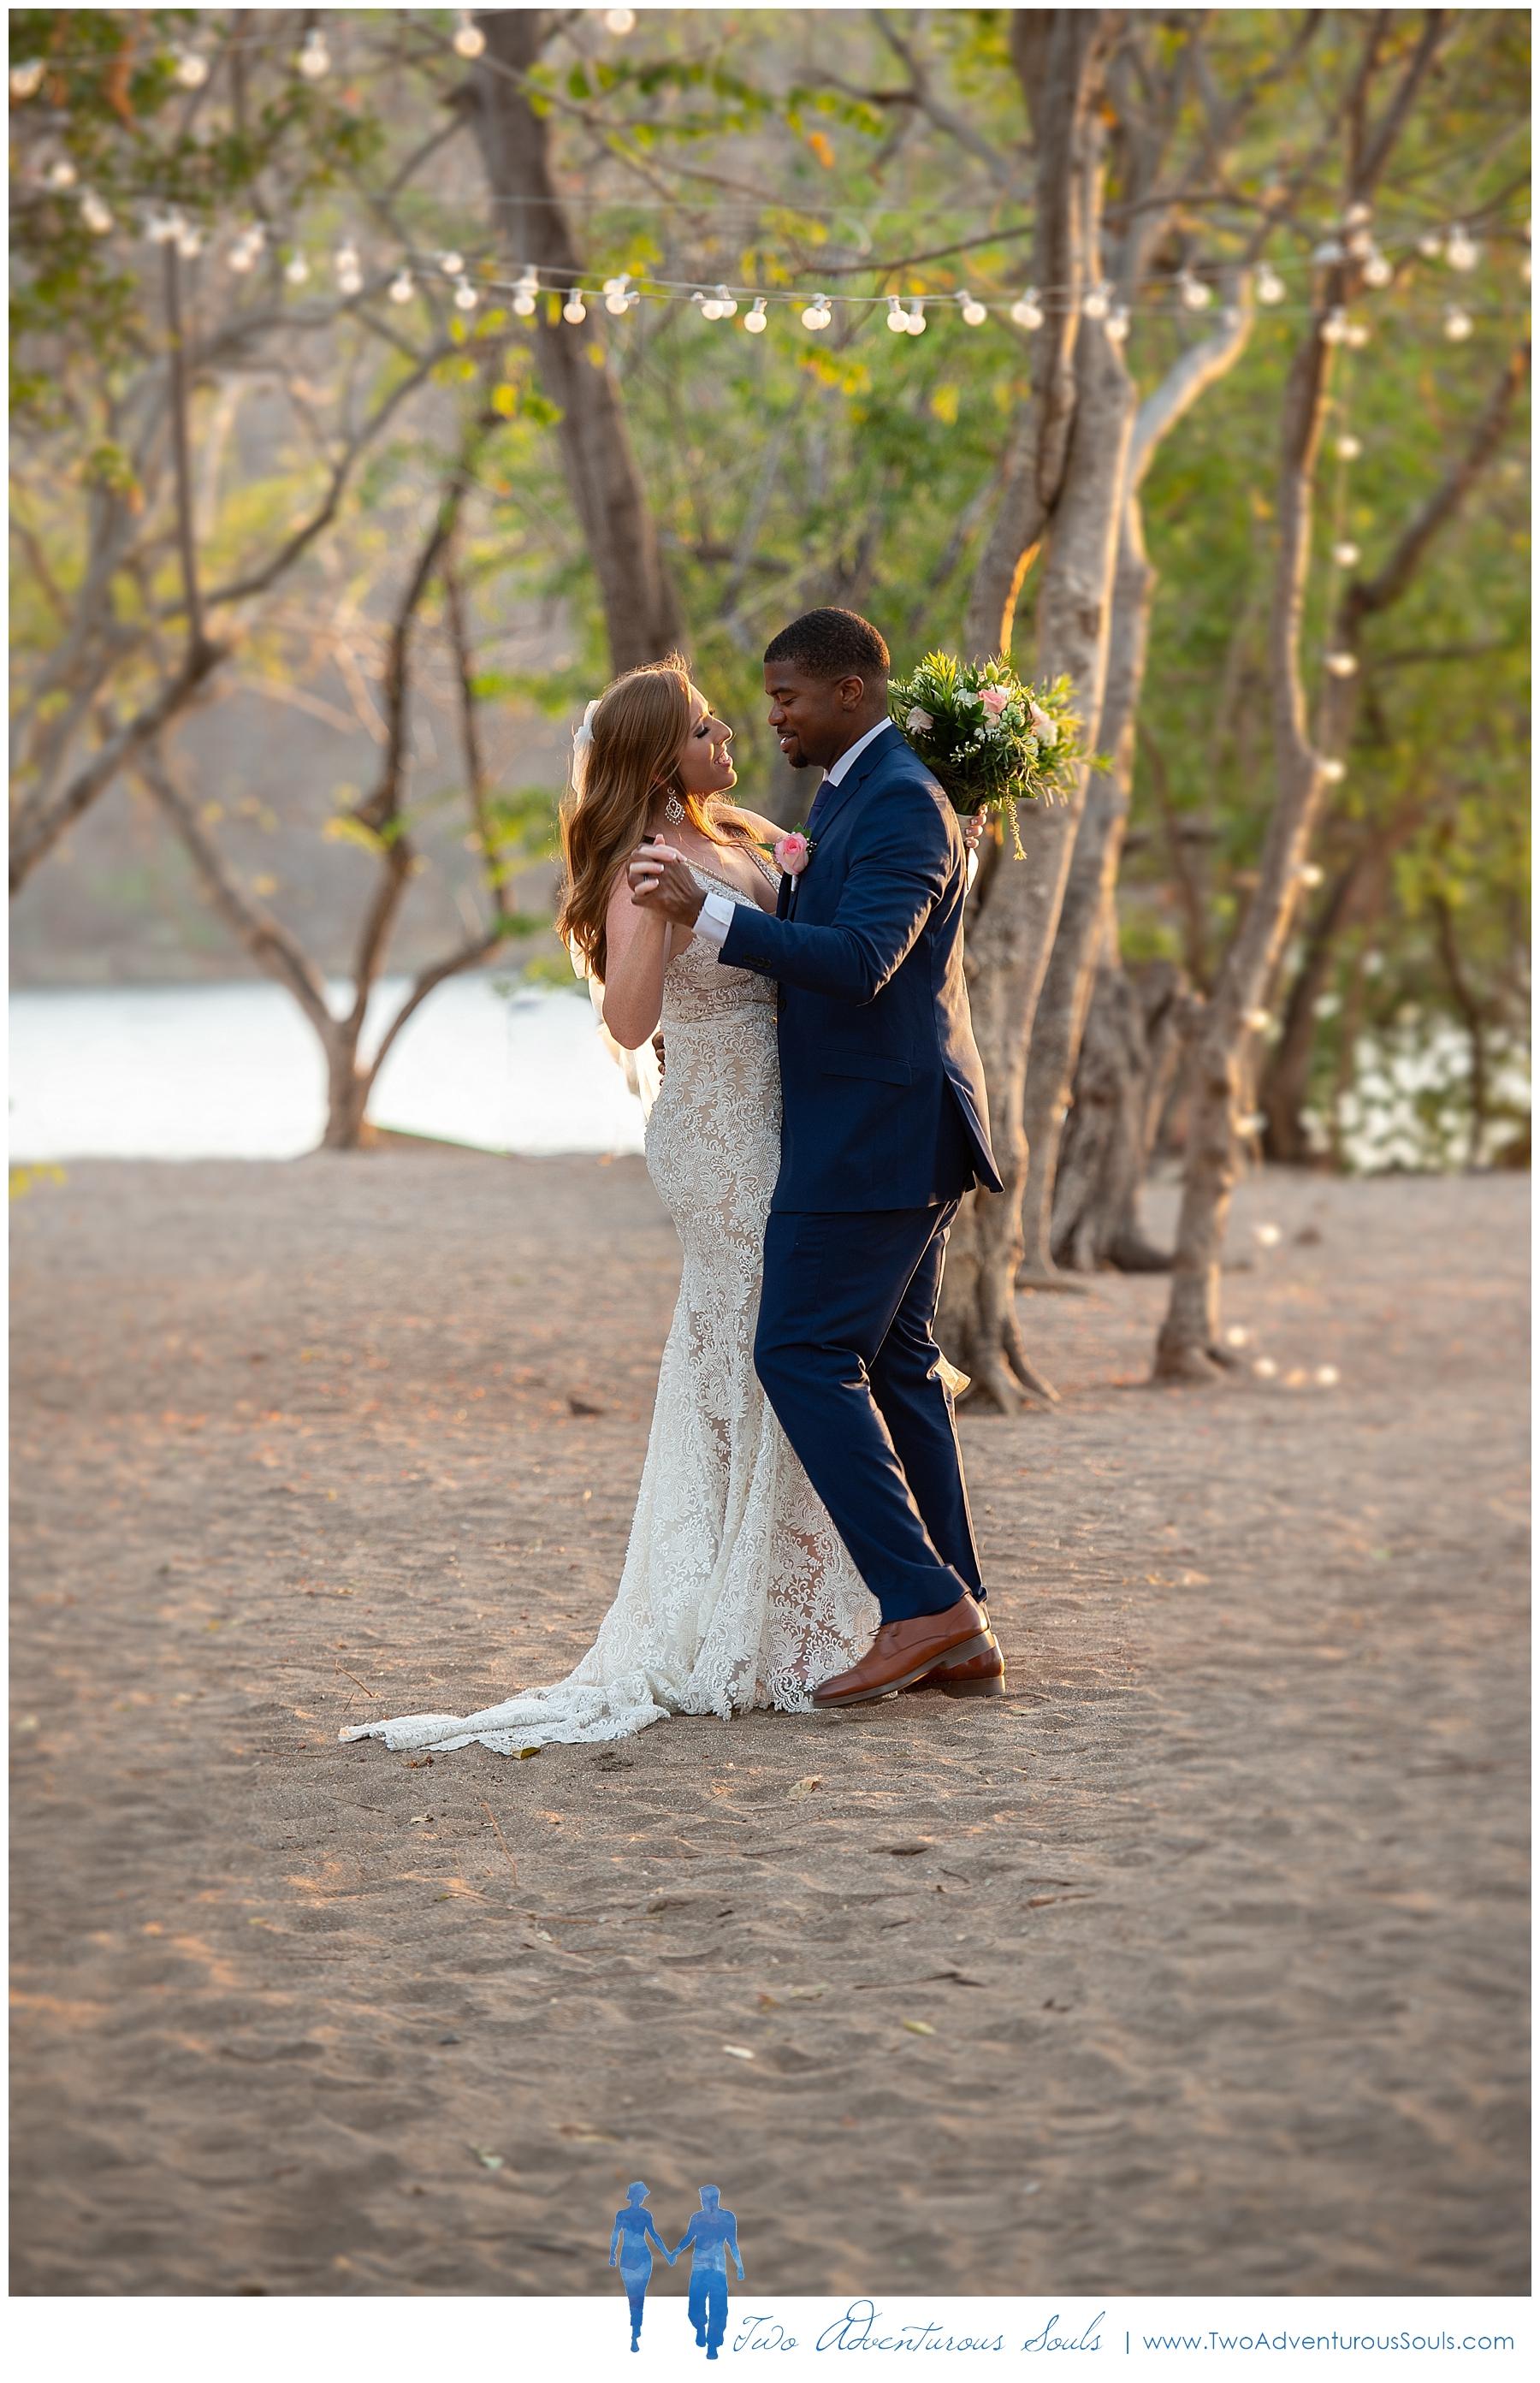 Costa Rica Wedding Photographers, Dreams las Mareas Wedding, Destination Wedding Photographers, Two Adventurous Souls - 022219_0033.jpg